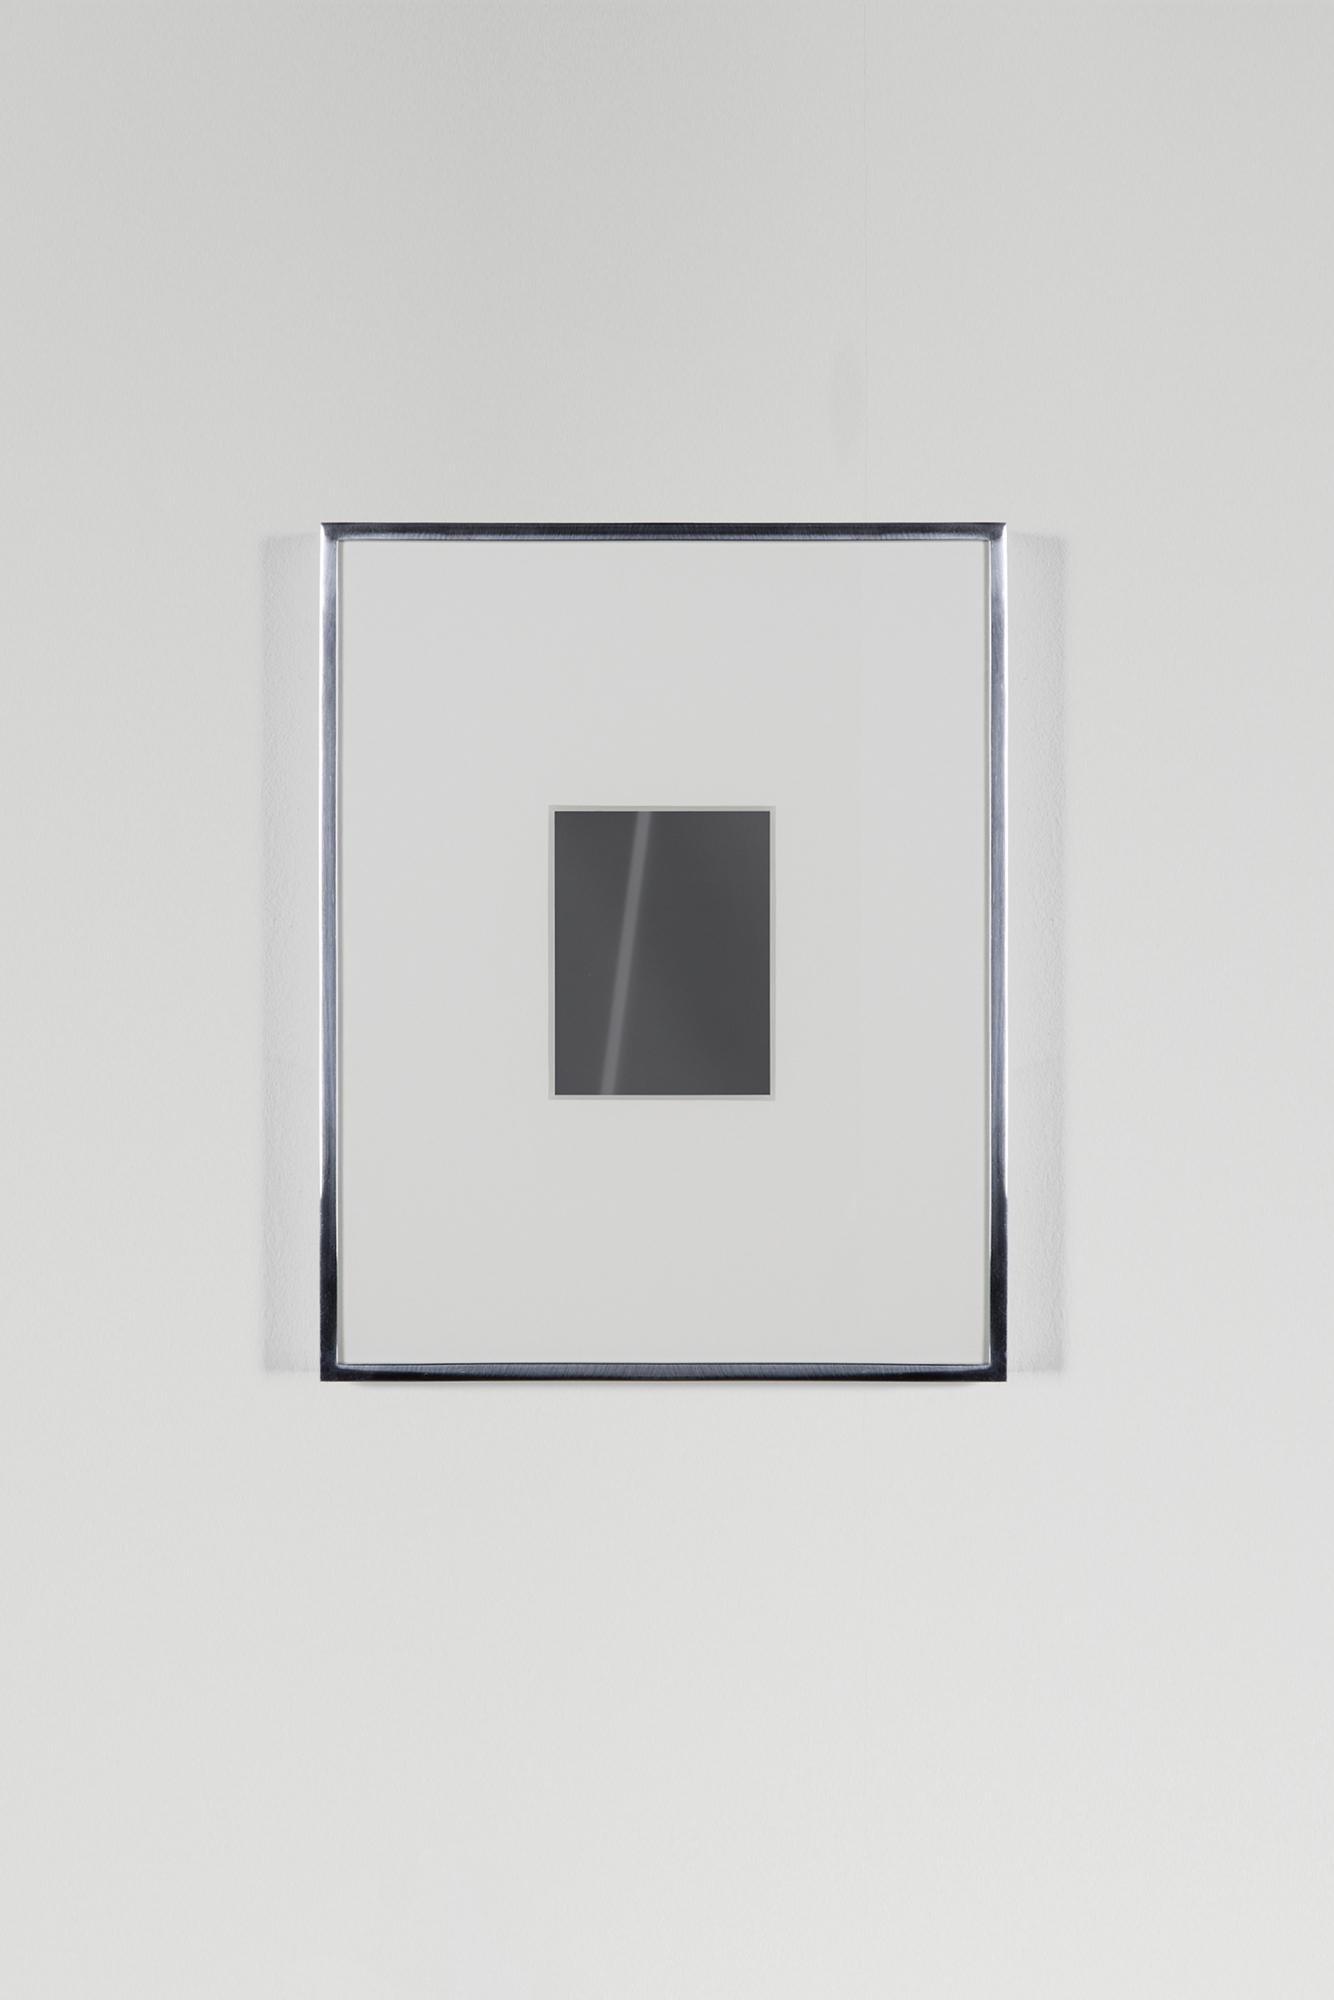 Transparency (Negative) [Kodak Portra 400NC Em. No. 1022: January 7–10, 2016 LAX/EWR EWR/LAX]    2017   Epson Ultrachrome K3 archival ink jet print on Museo Silver Rag Paper  14 x 11 inches   Transparencies, 2014–